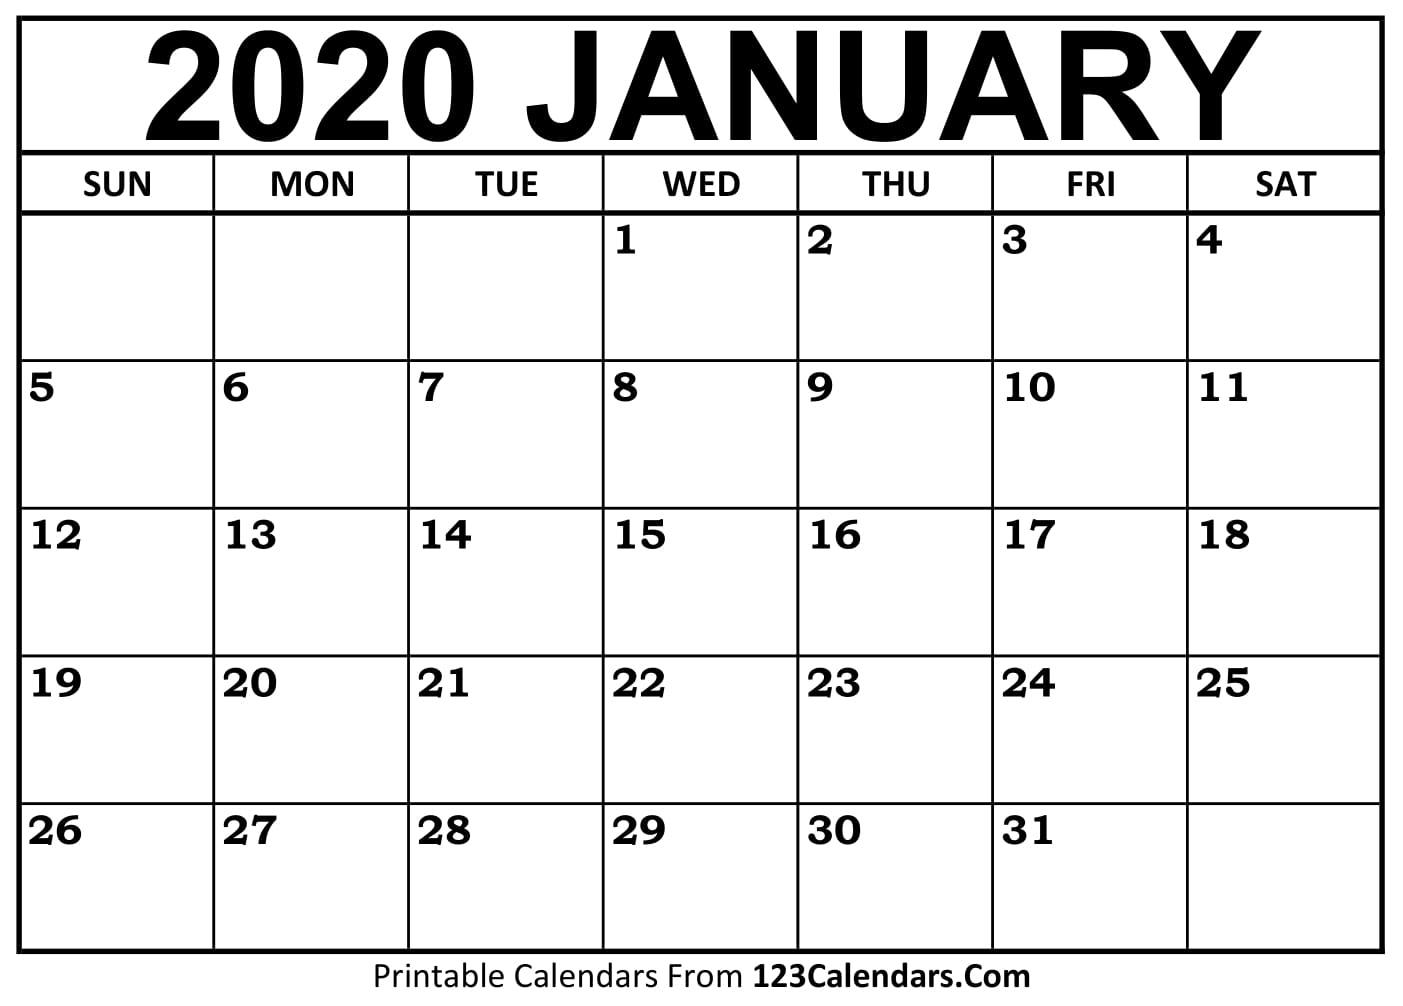 Free Printable Calendar | 123Calendars for 123 Calendars December 2020